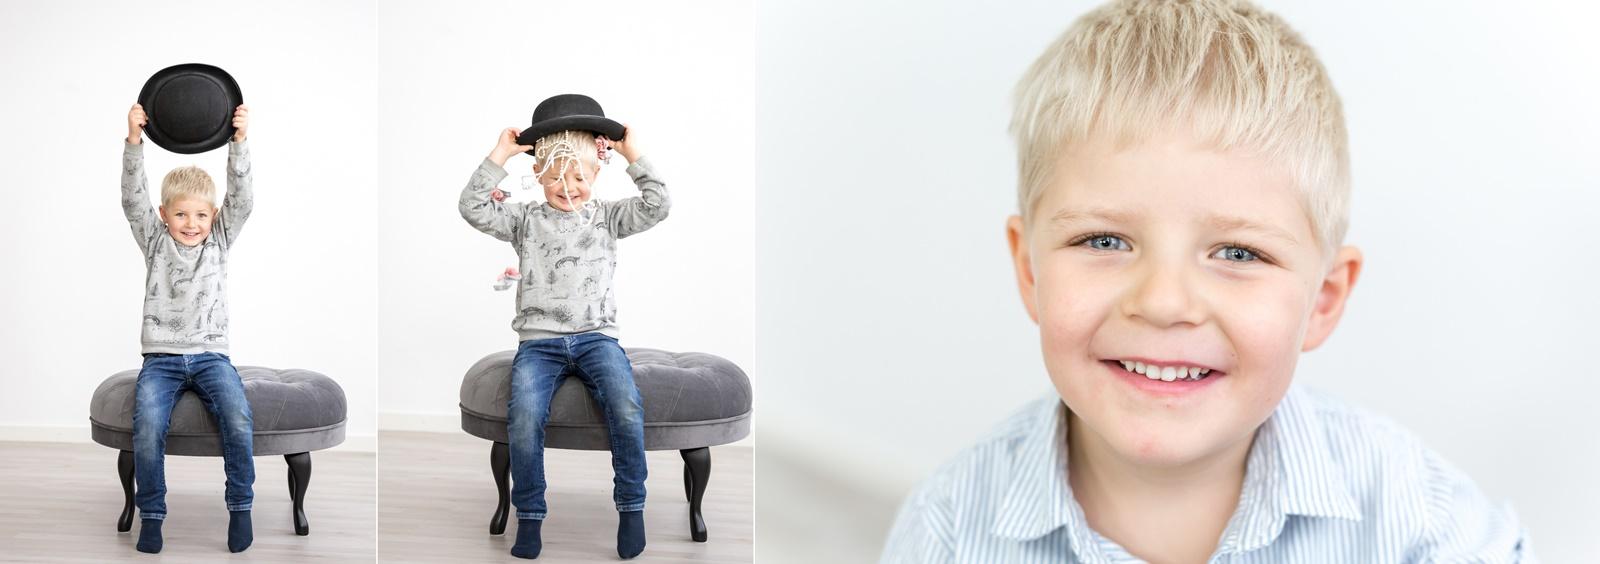 Familjebilder 2018  hos Fröken Foto Malin Richardsson Studio i Skene  (78)-horz 1600.jpg